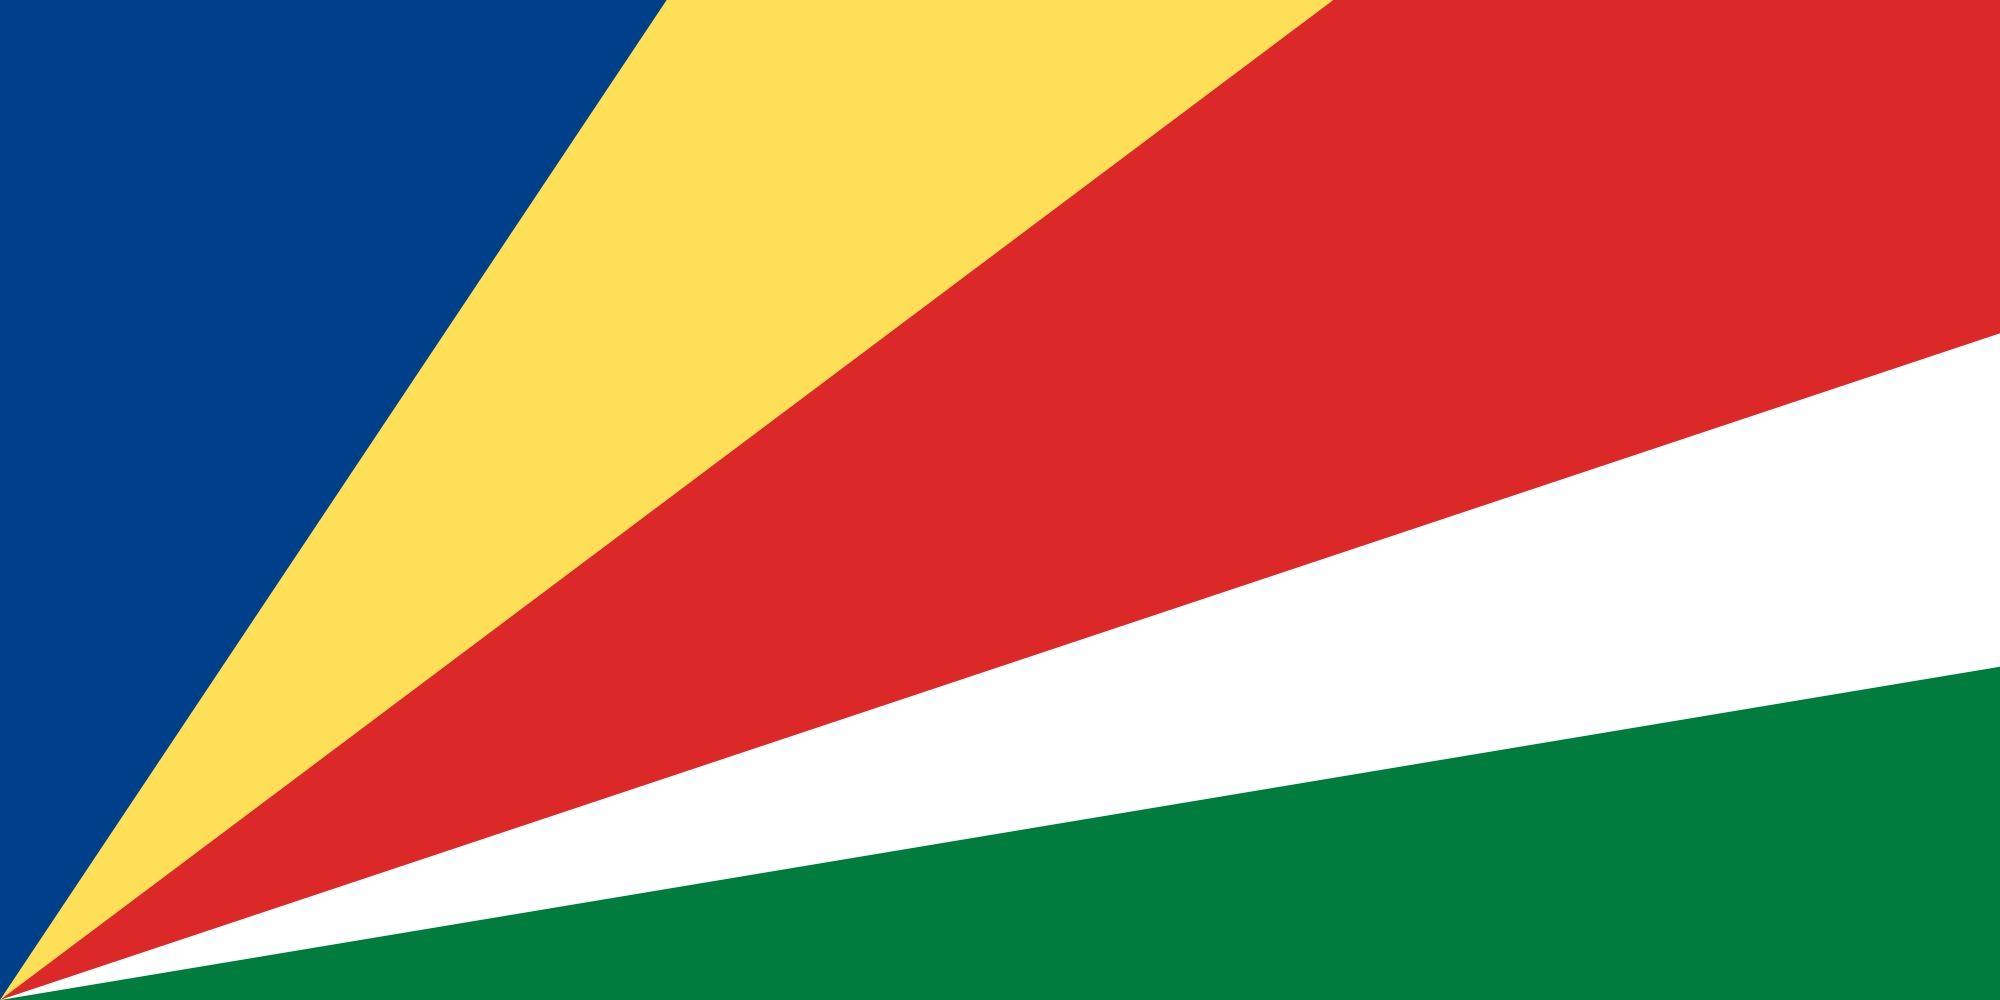 Singapore Beaches Zugriff Auf Unsere Website Viel Mehr Informationen Https Storelatina Com Singapore Travelling Seychelles Flag Flags Of The World Flag